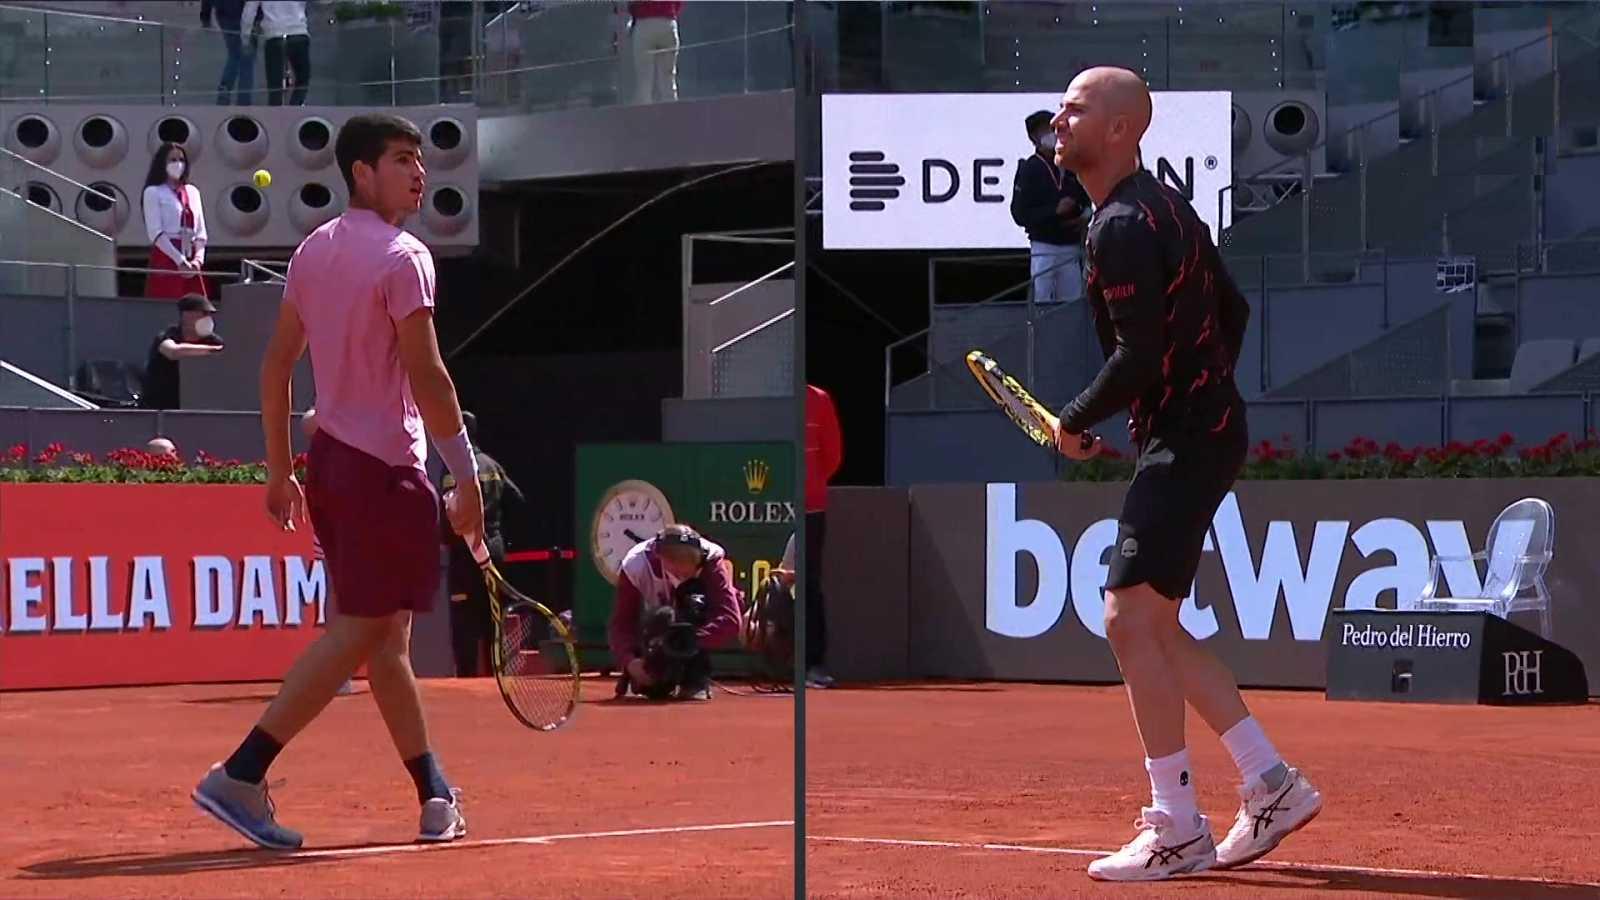 Tenis - ATP Mutua Madrid Open: Adrian Mannarino - Carlos Alcaraz  - ver ahora